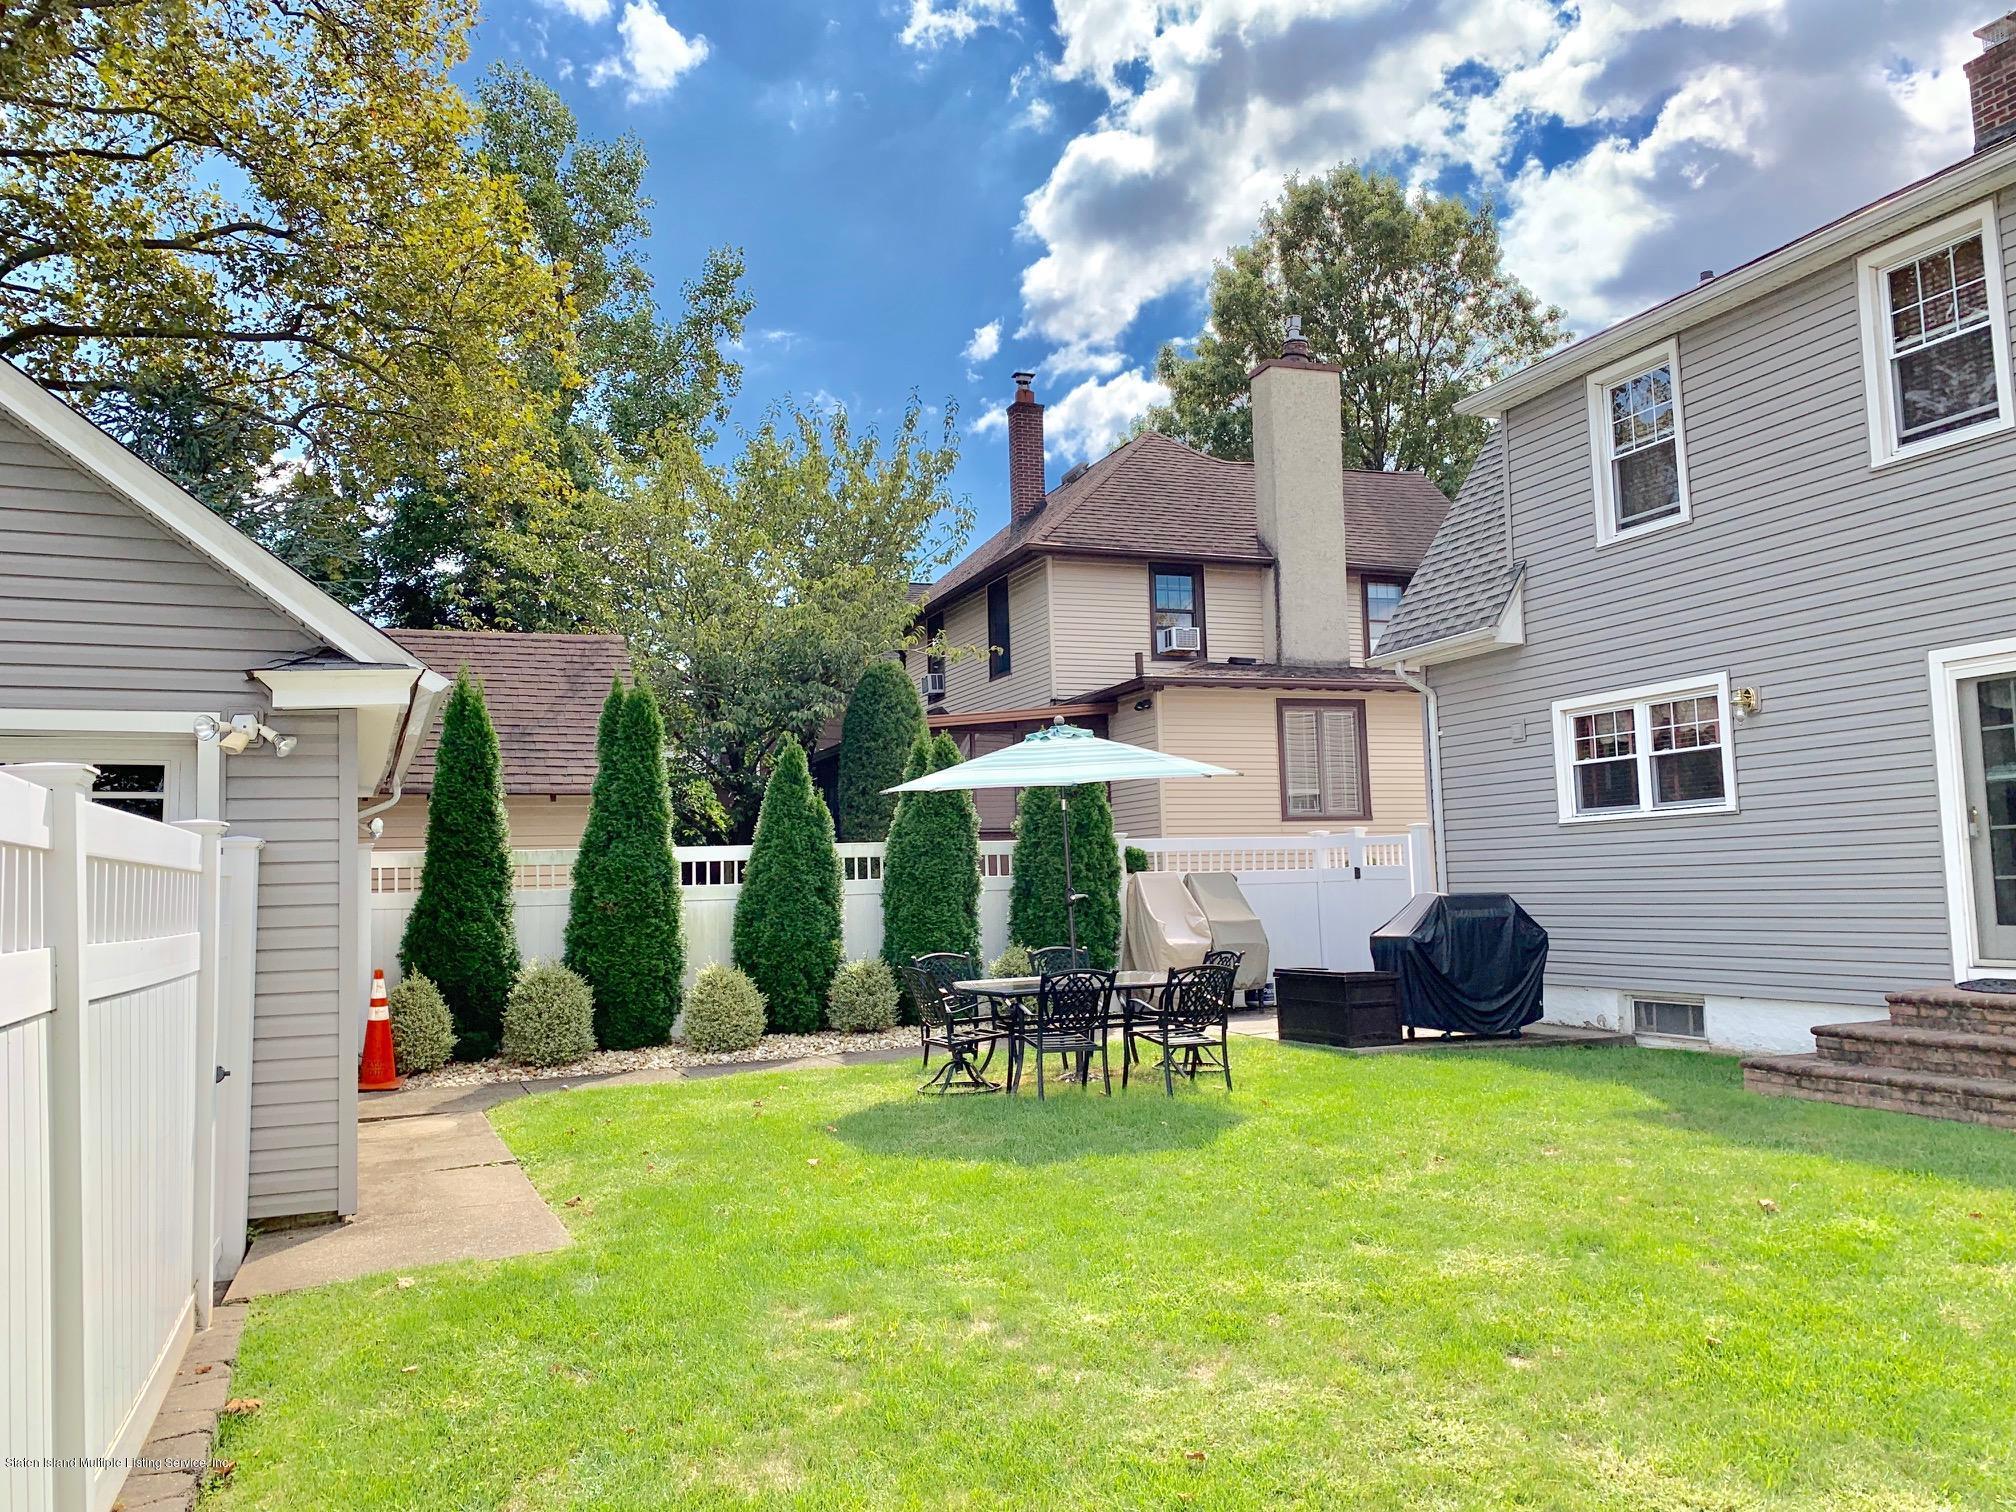 Single Family - Detached 195 Fairview Avenue  Staten Island, NY 10314, MLS-1132423-40